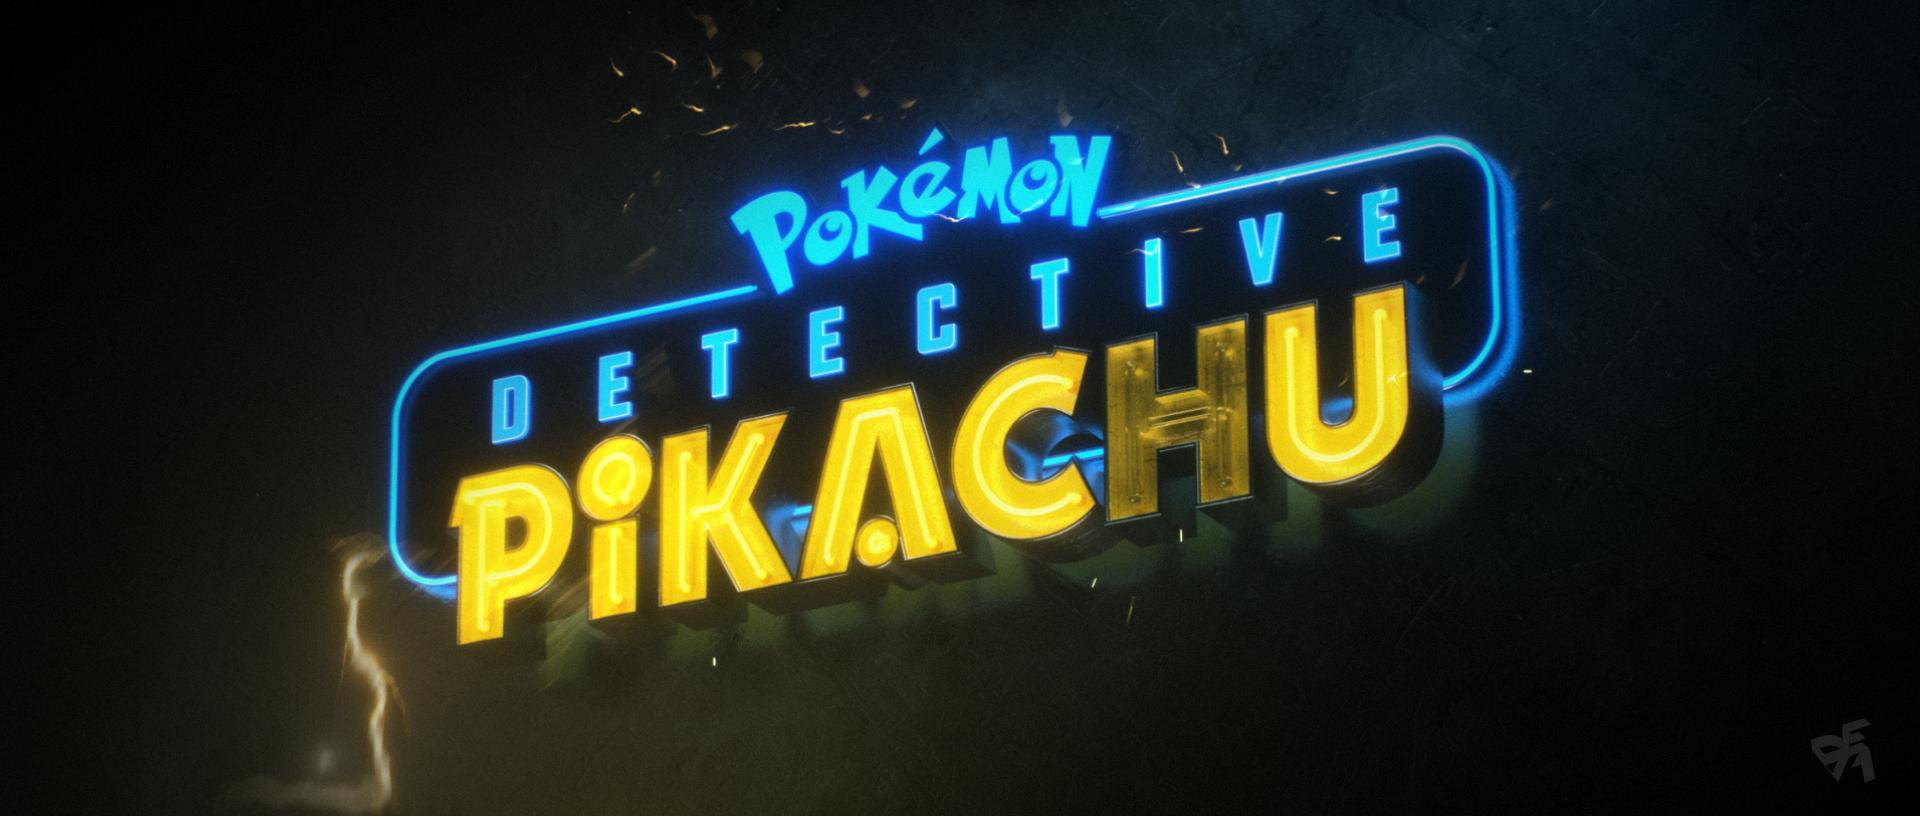 DetPikachu_CONCEPT_06.jpg